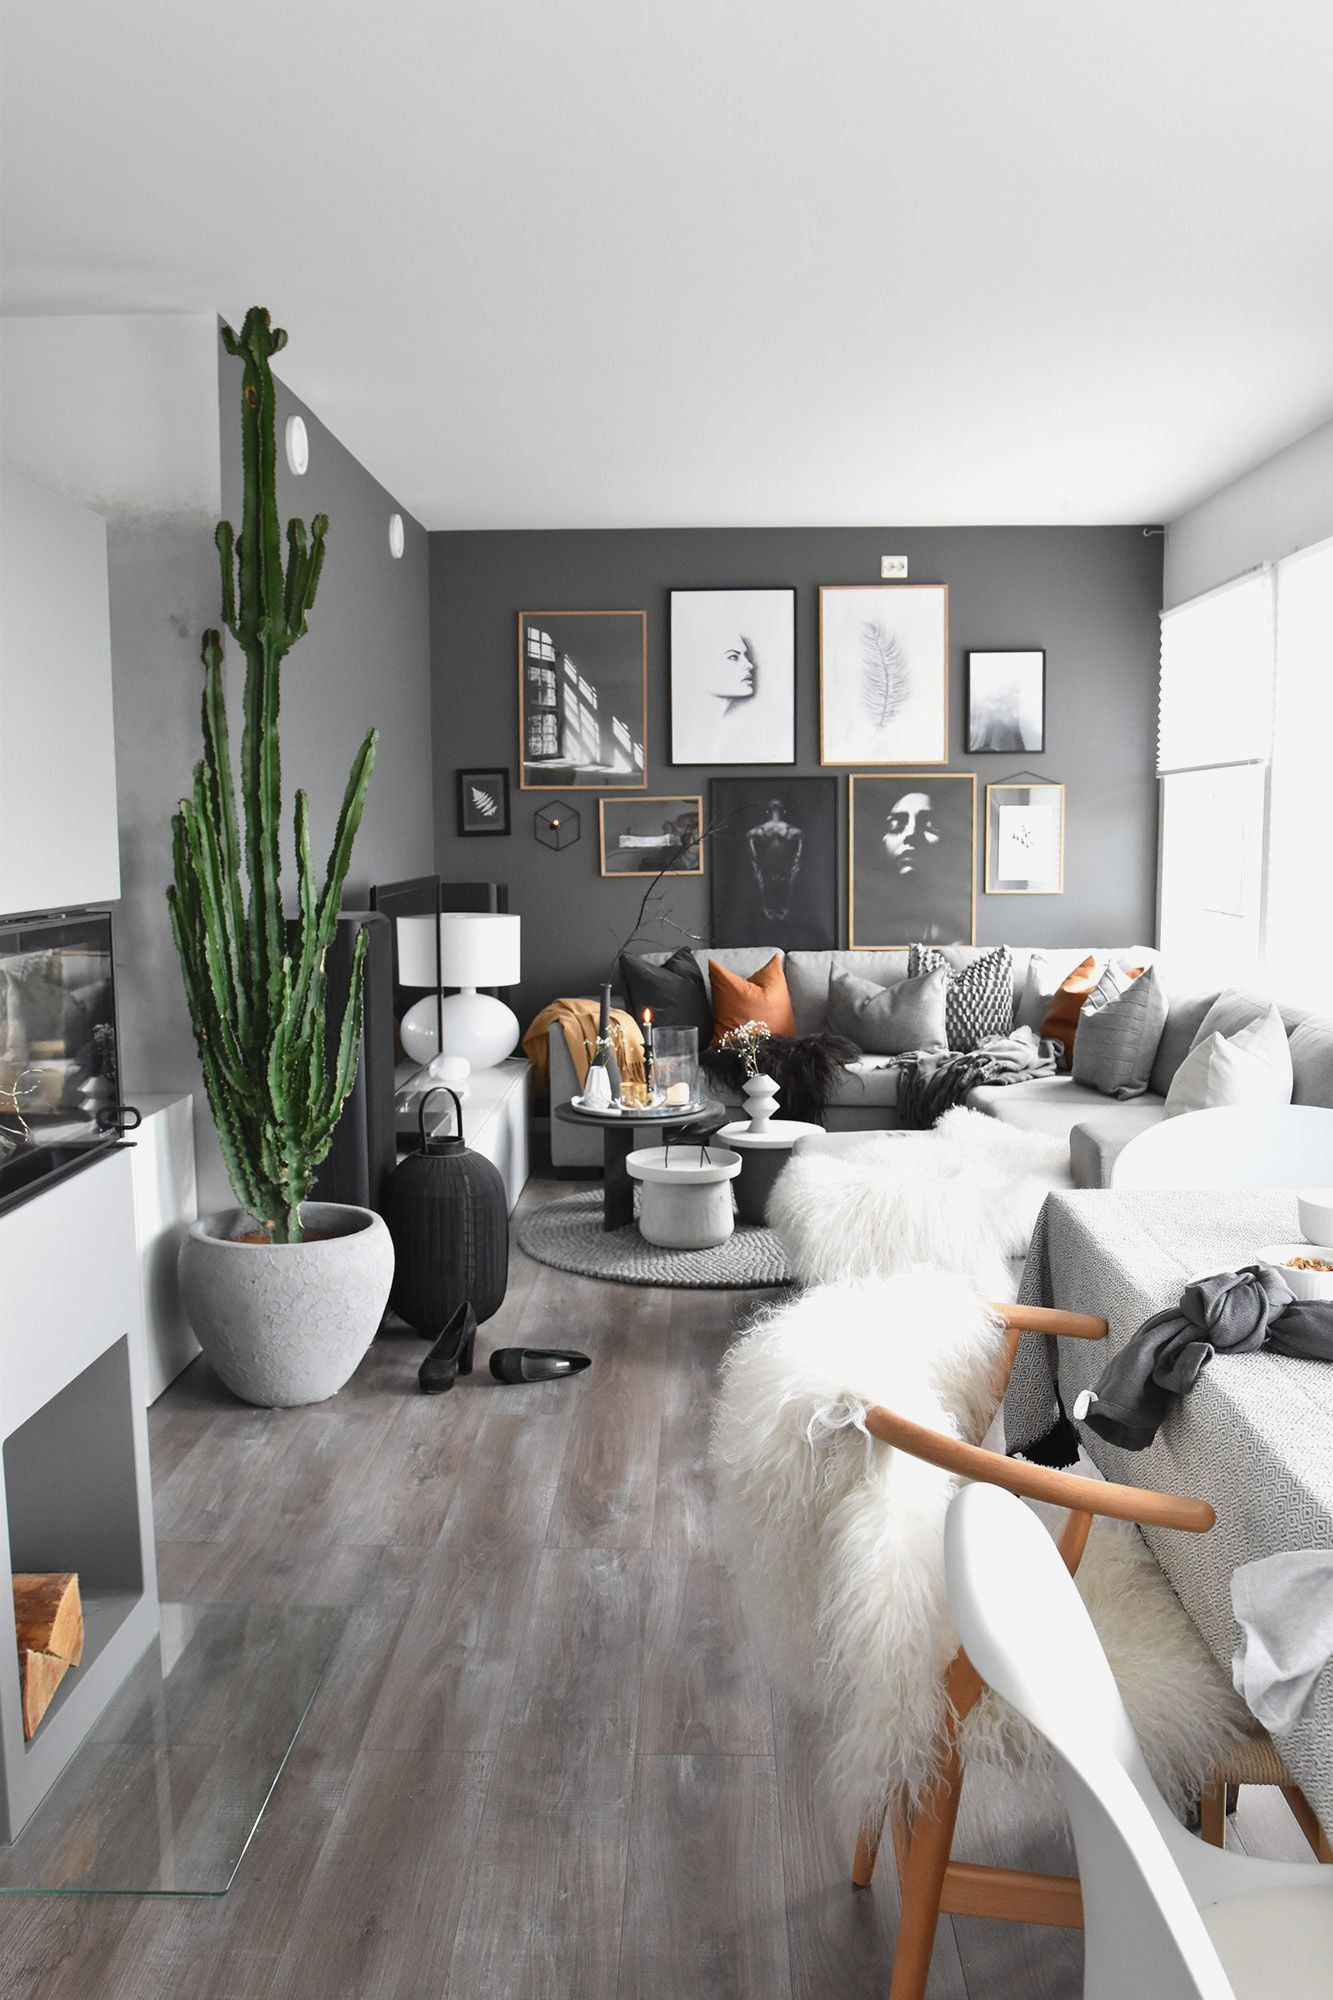 Dream Living Room Inspiration March 2019 Black Walls Li